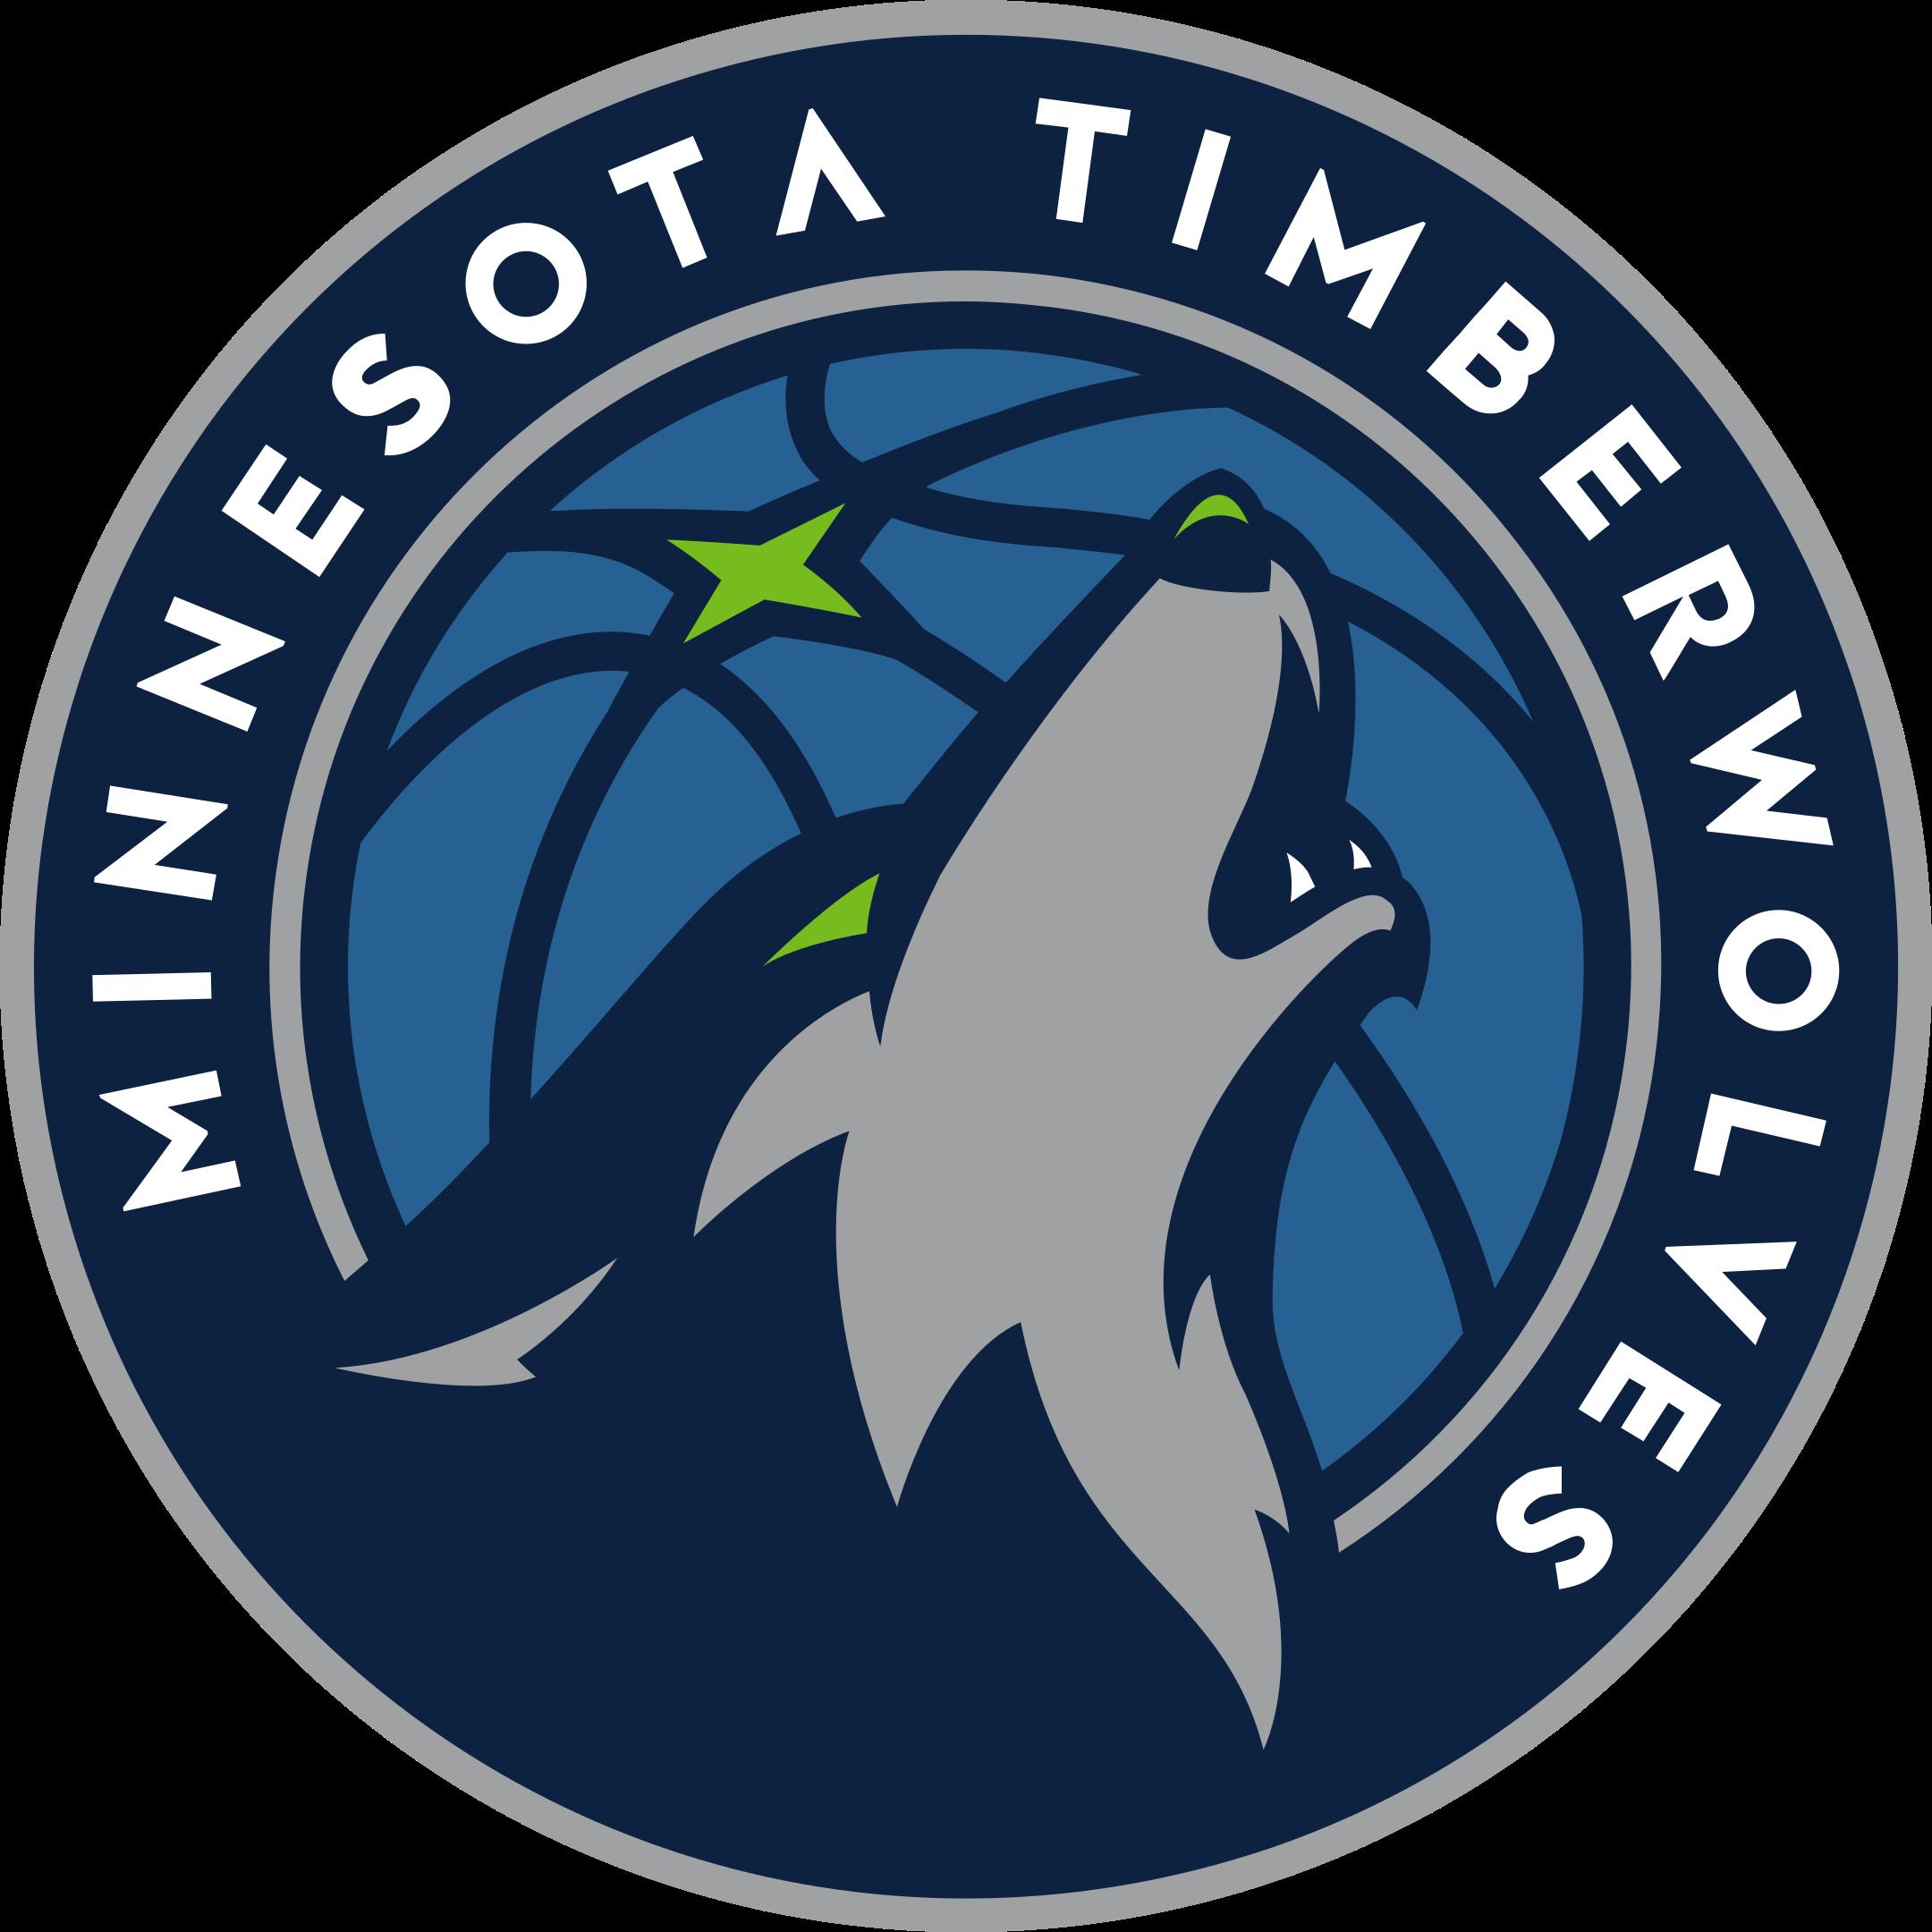 minnesota timberwolves logo 1 - Minnesota Timberwolves Logo